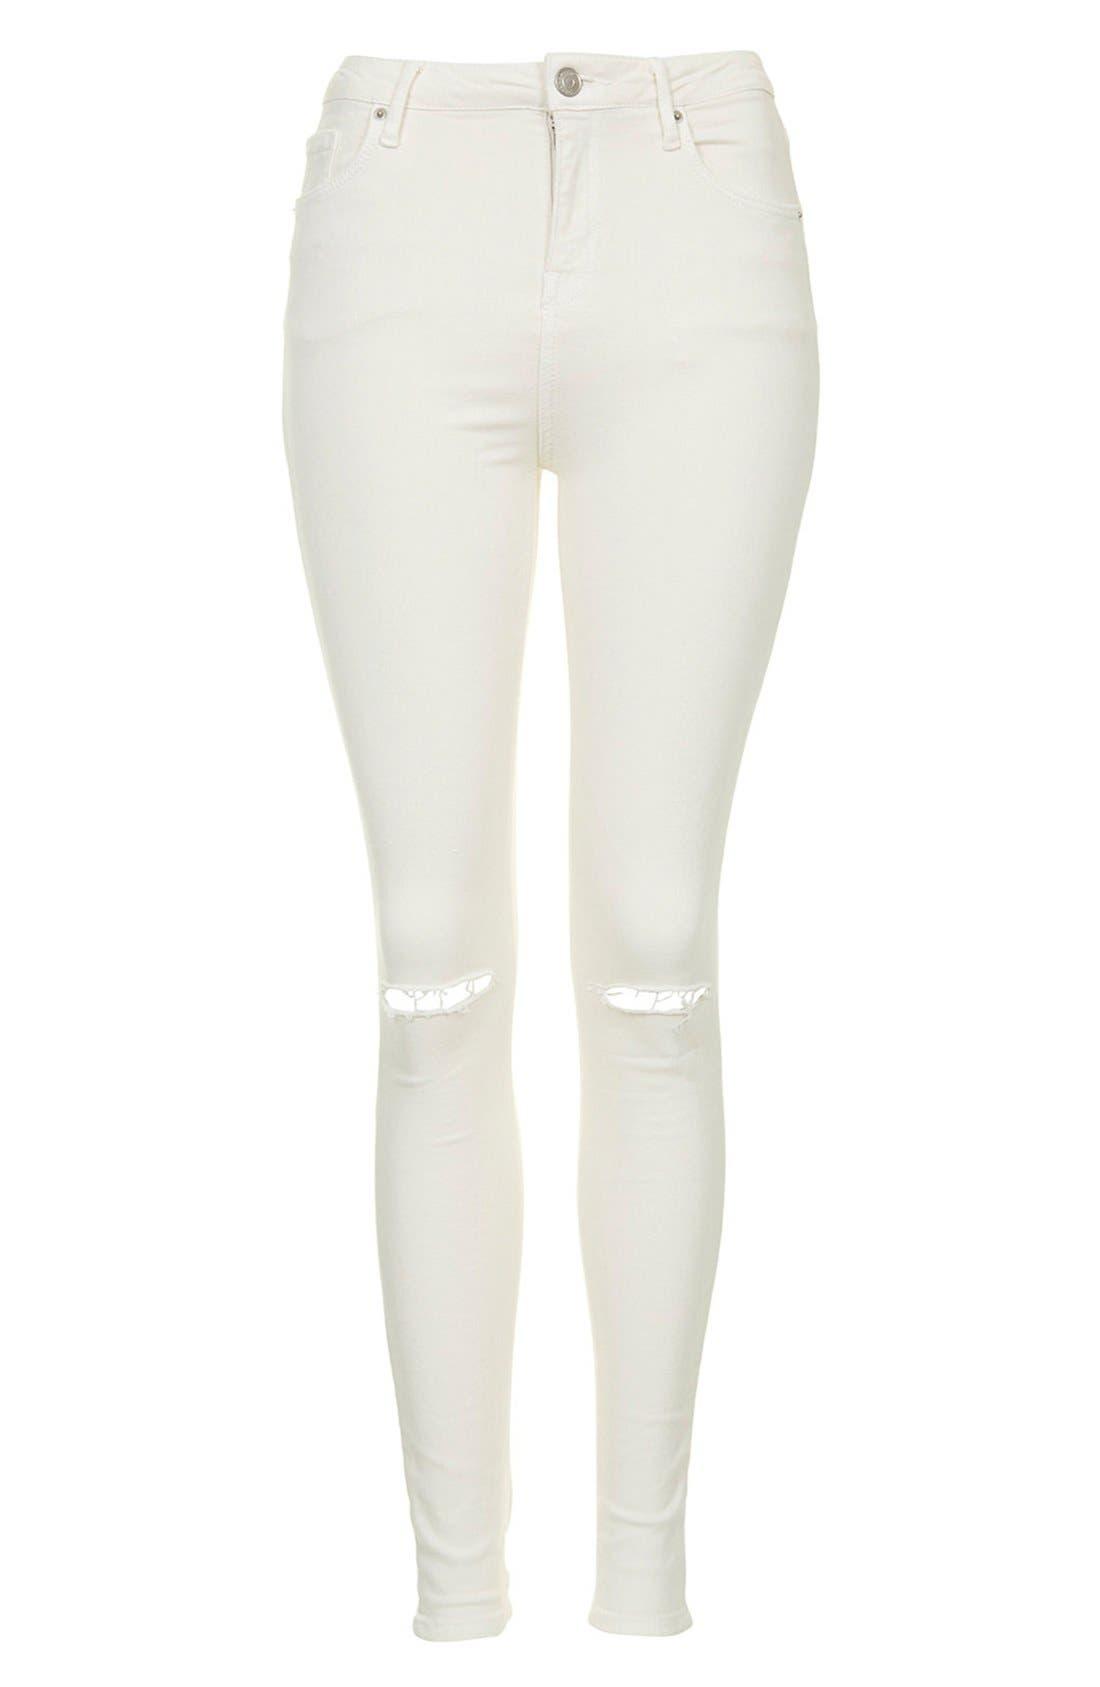 Alternate Image 3  - Topshop Moto 'Jamie' Ripped Jeans (White)